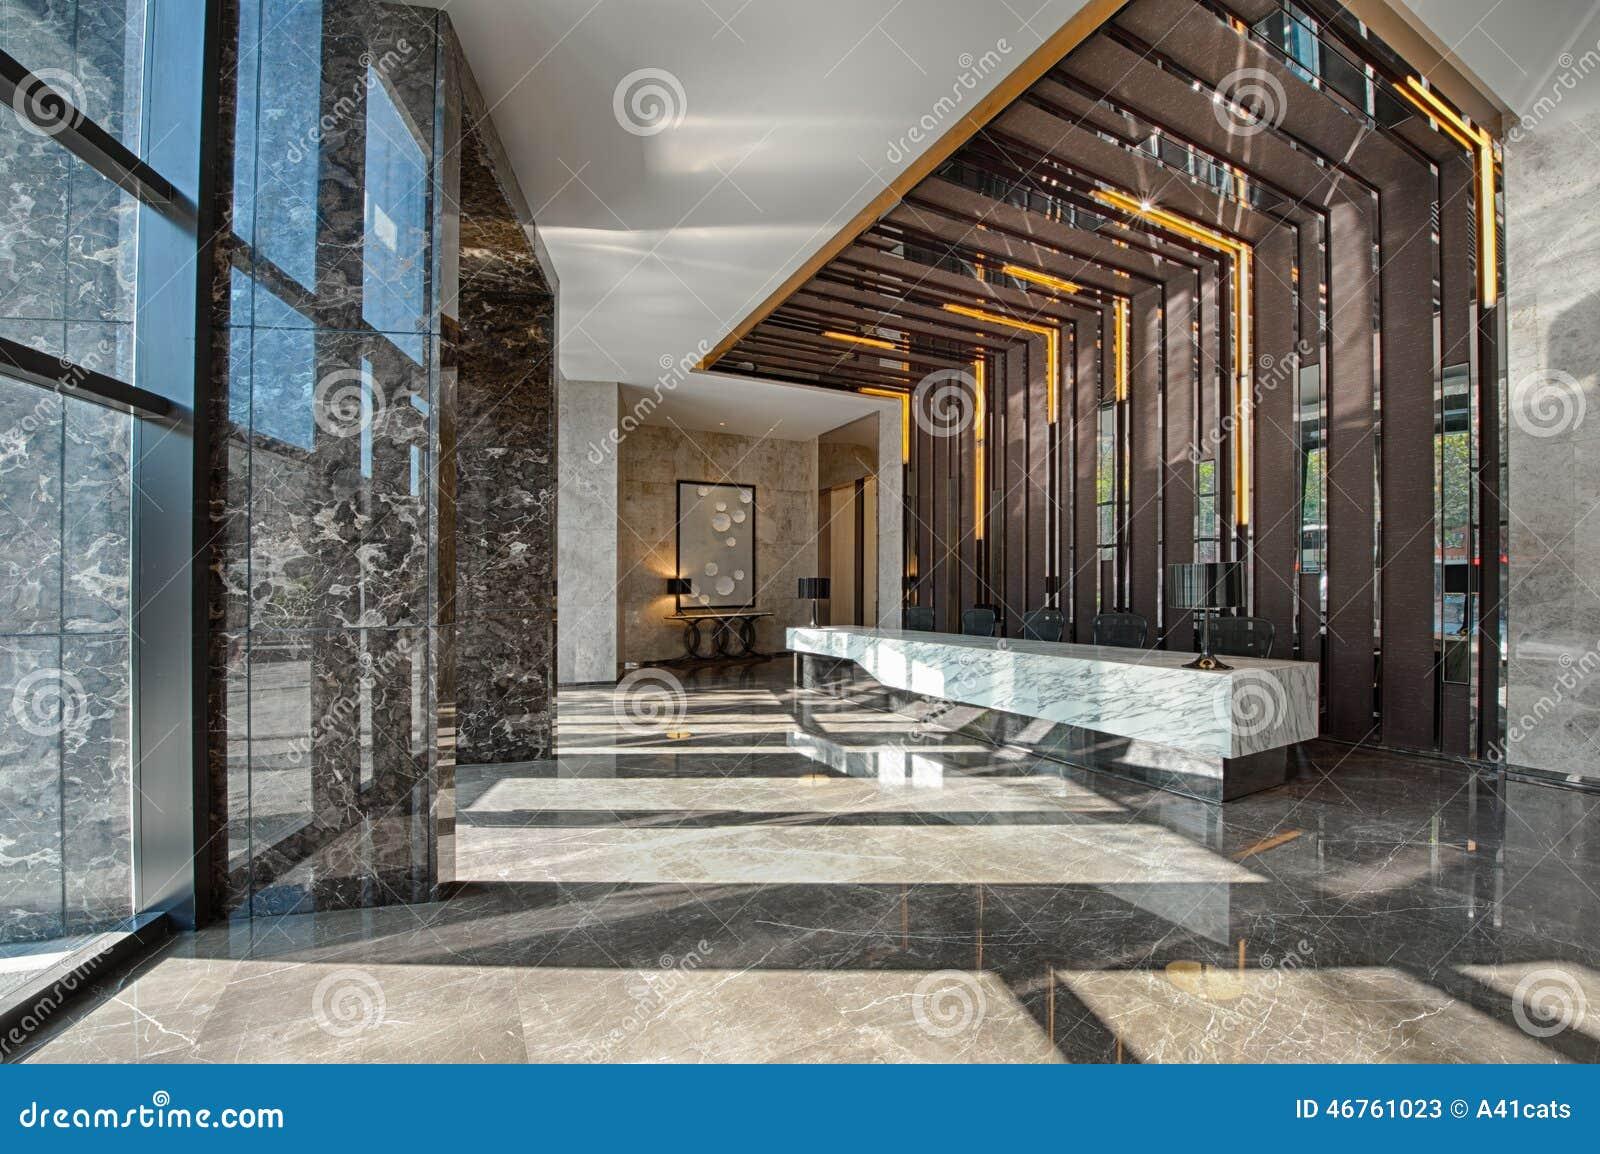 Zone daccueil dun bureau de vente image stock image du hôtel